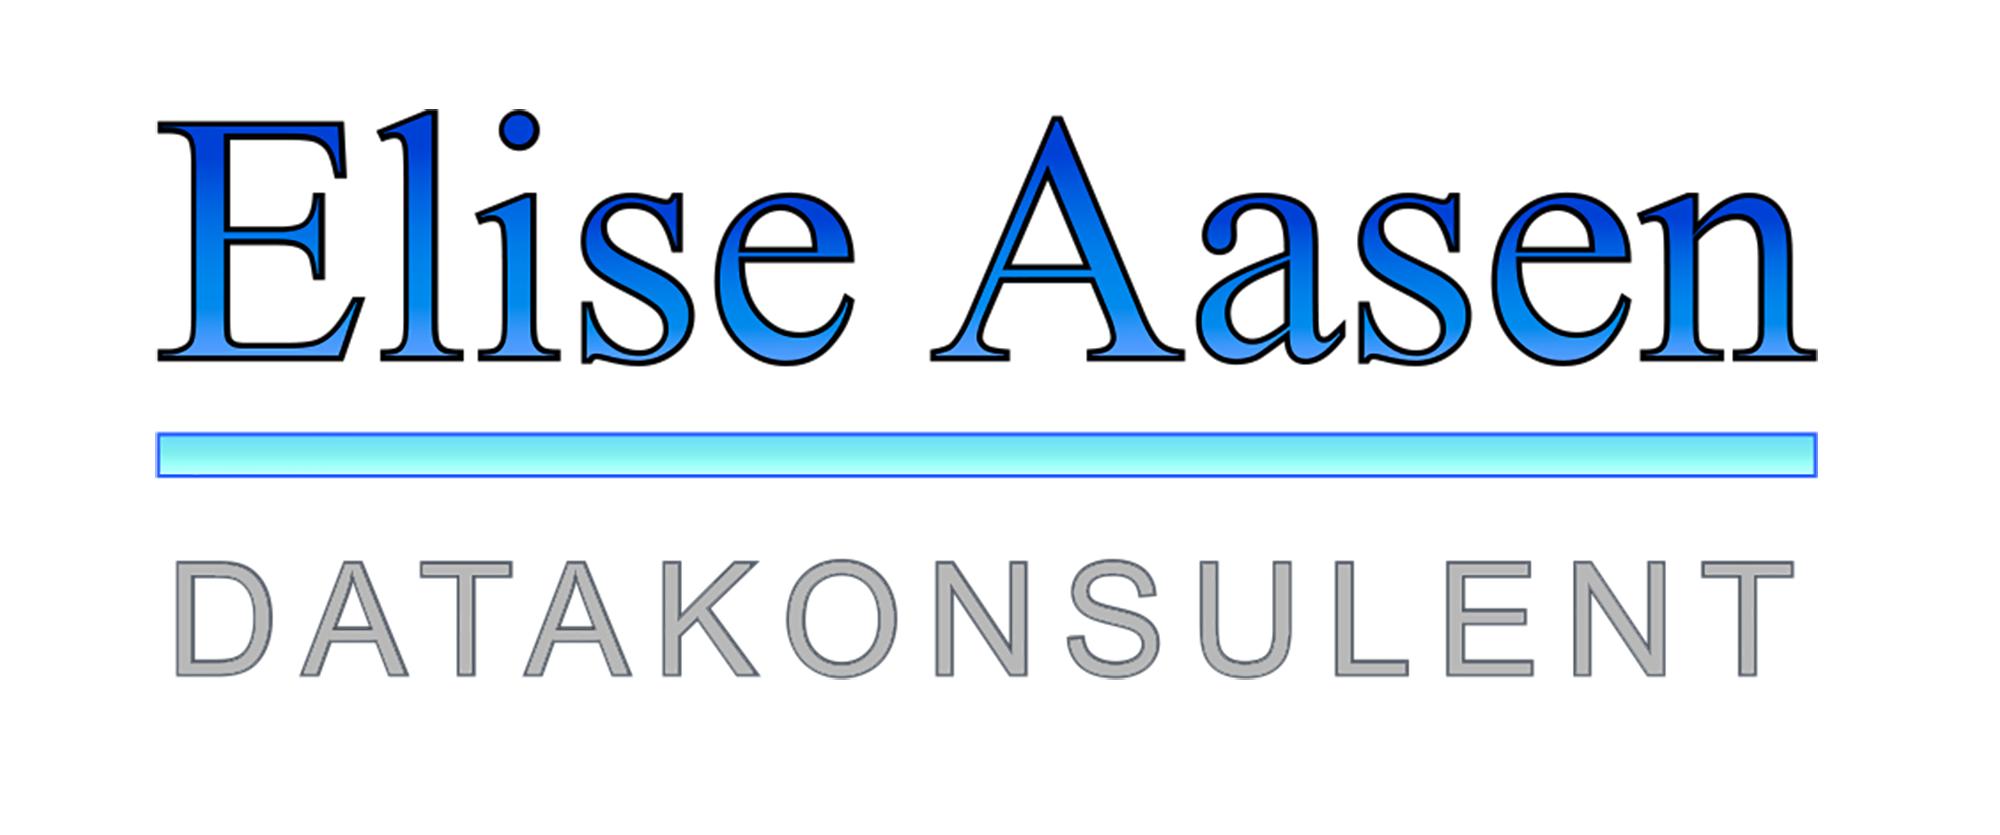 Datakonsulent Elise Aasen